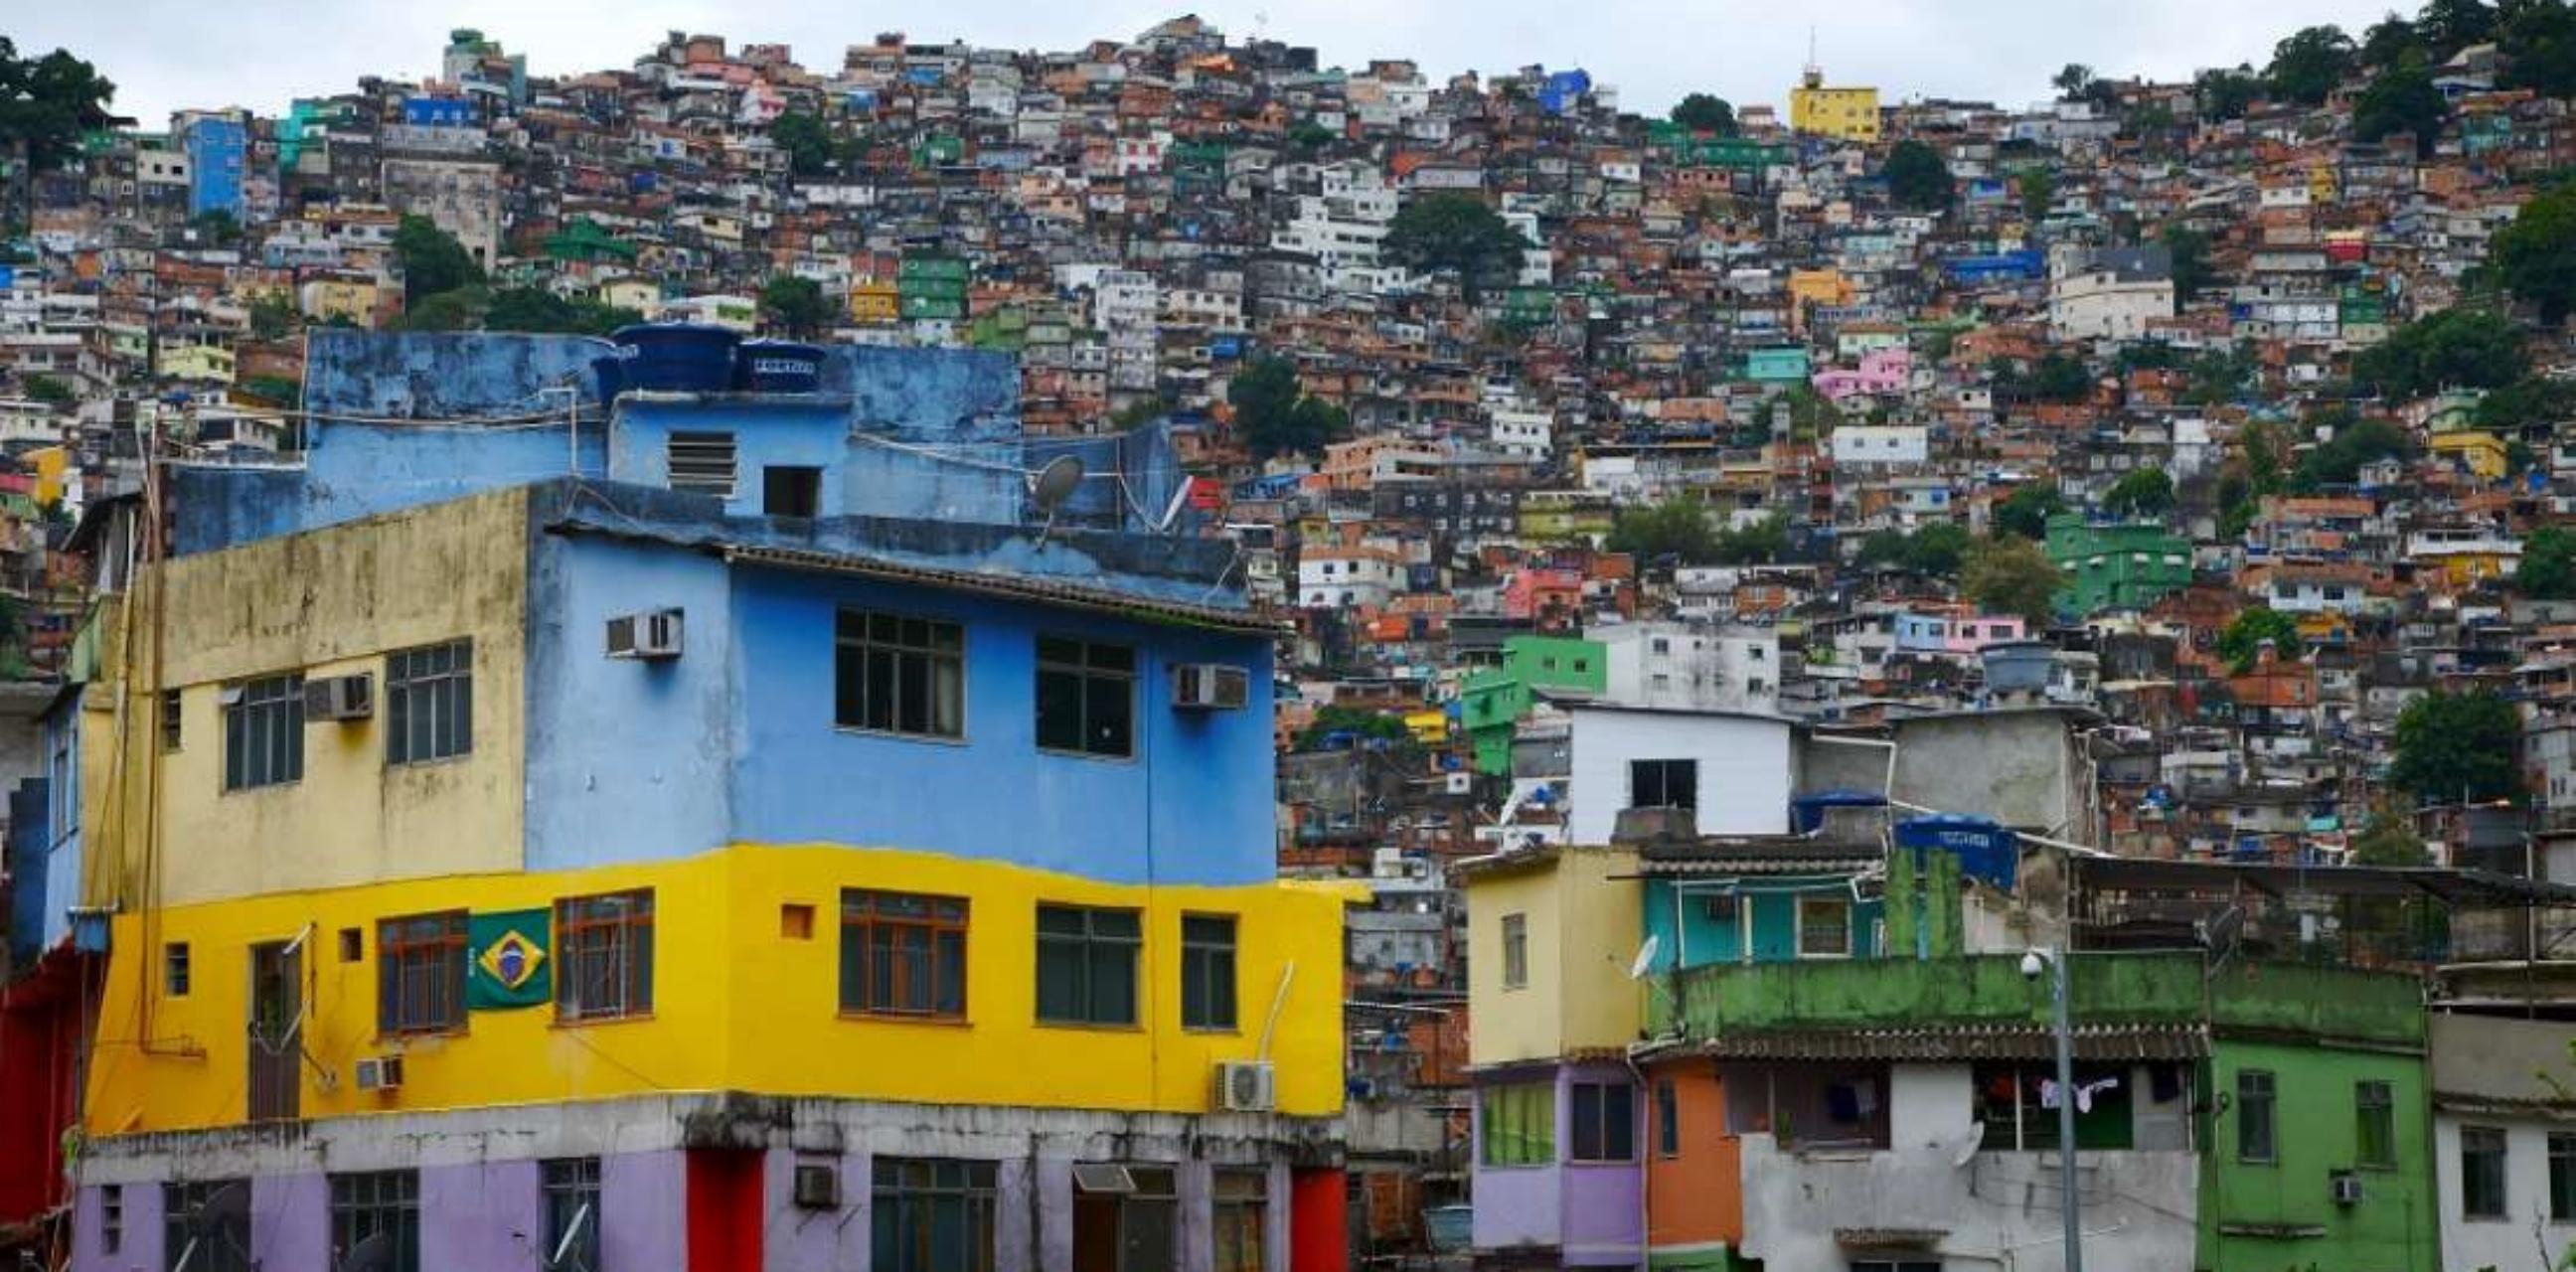 Cegah penyebaran corona, anggota geng di Brasil serukan jam malam